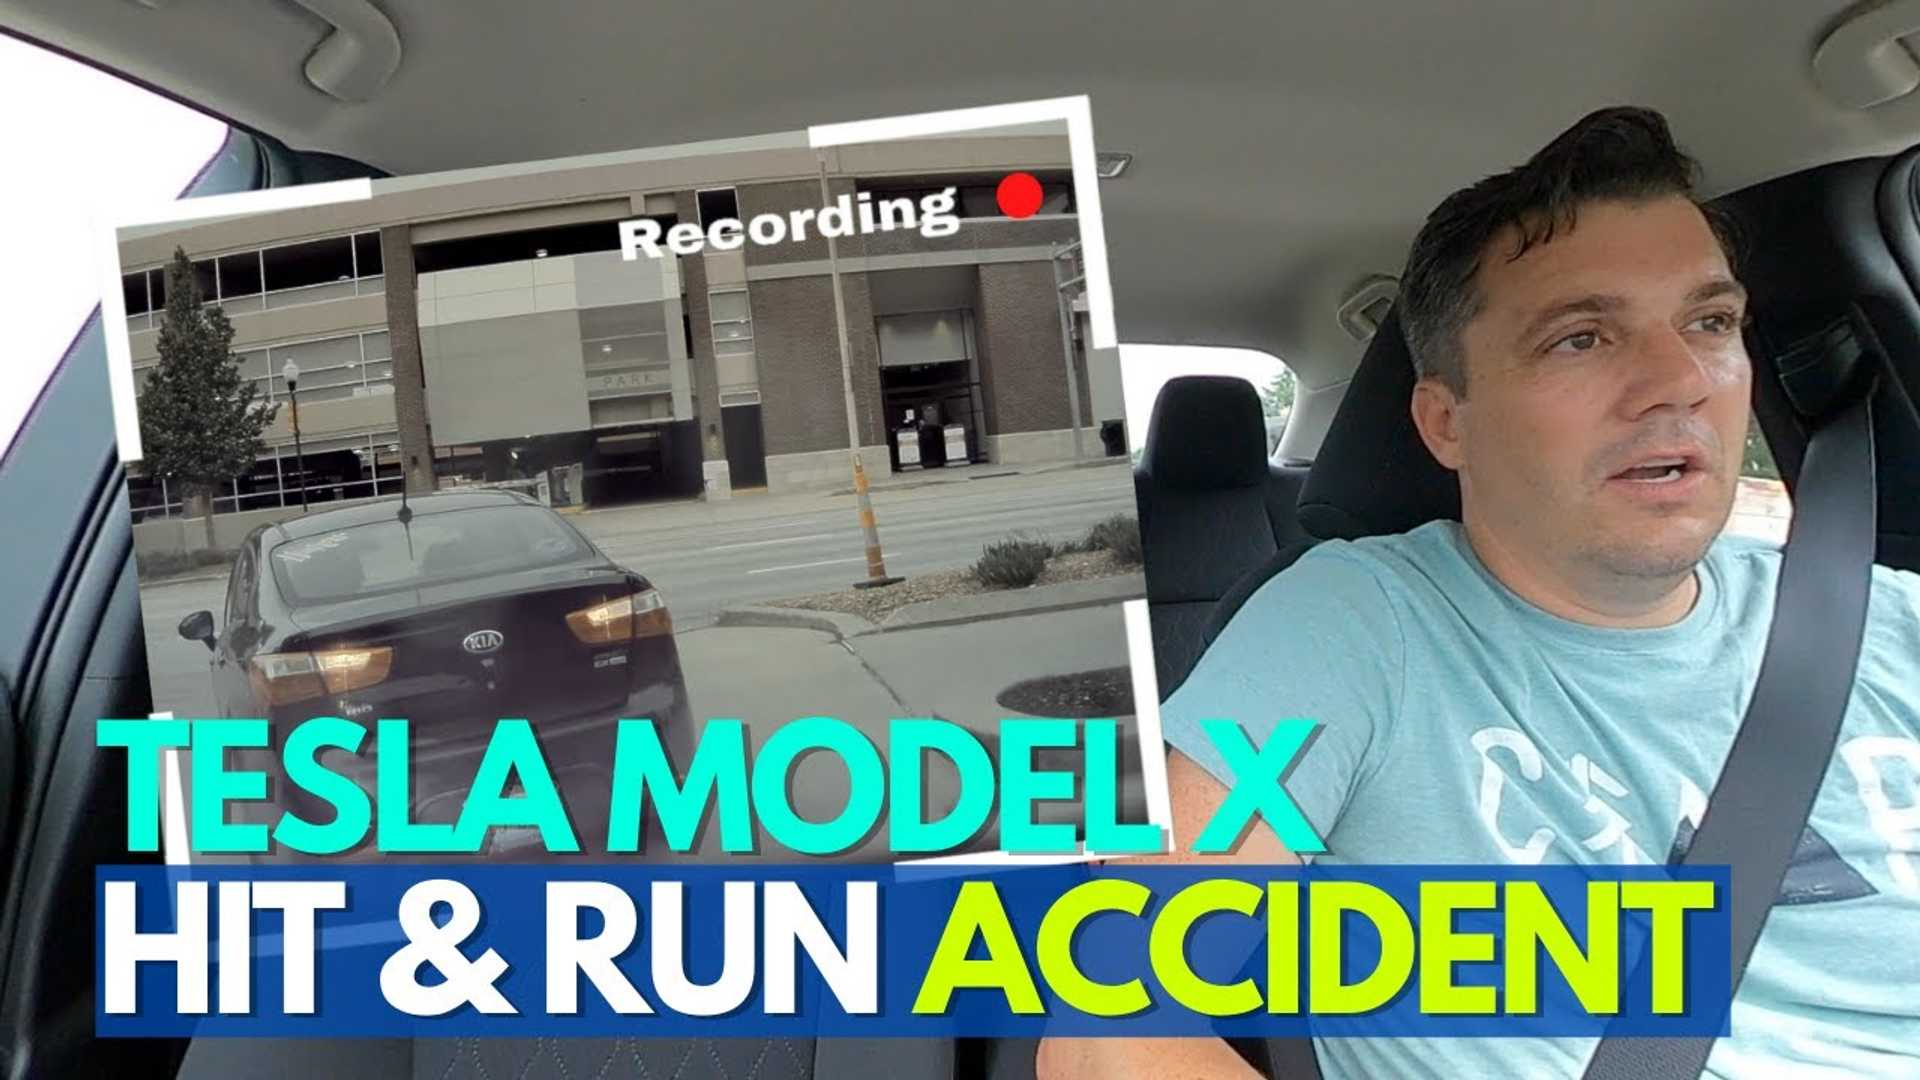 Trail Less Traveled: Brand-New Tesla Model X Hit-And-Run Crash Repair